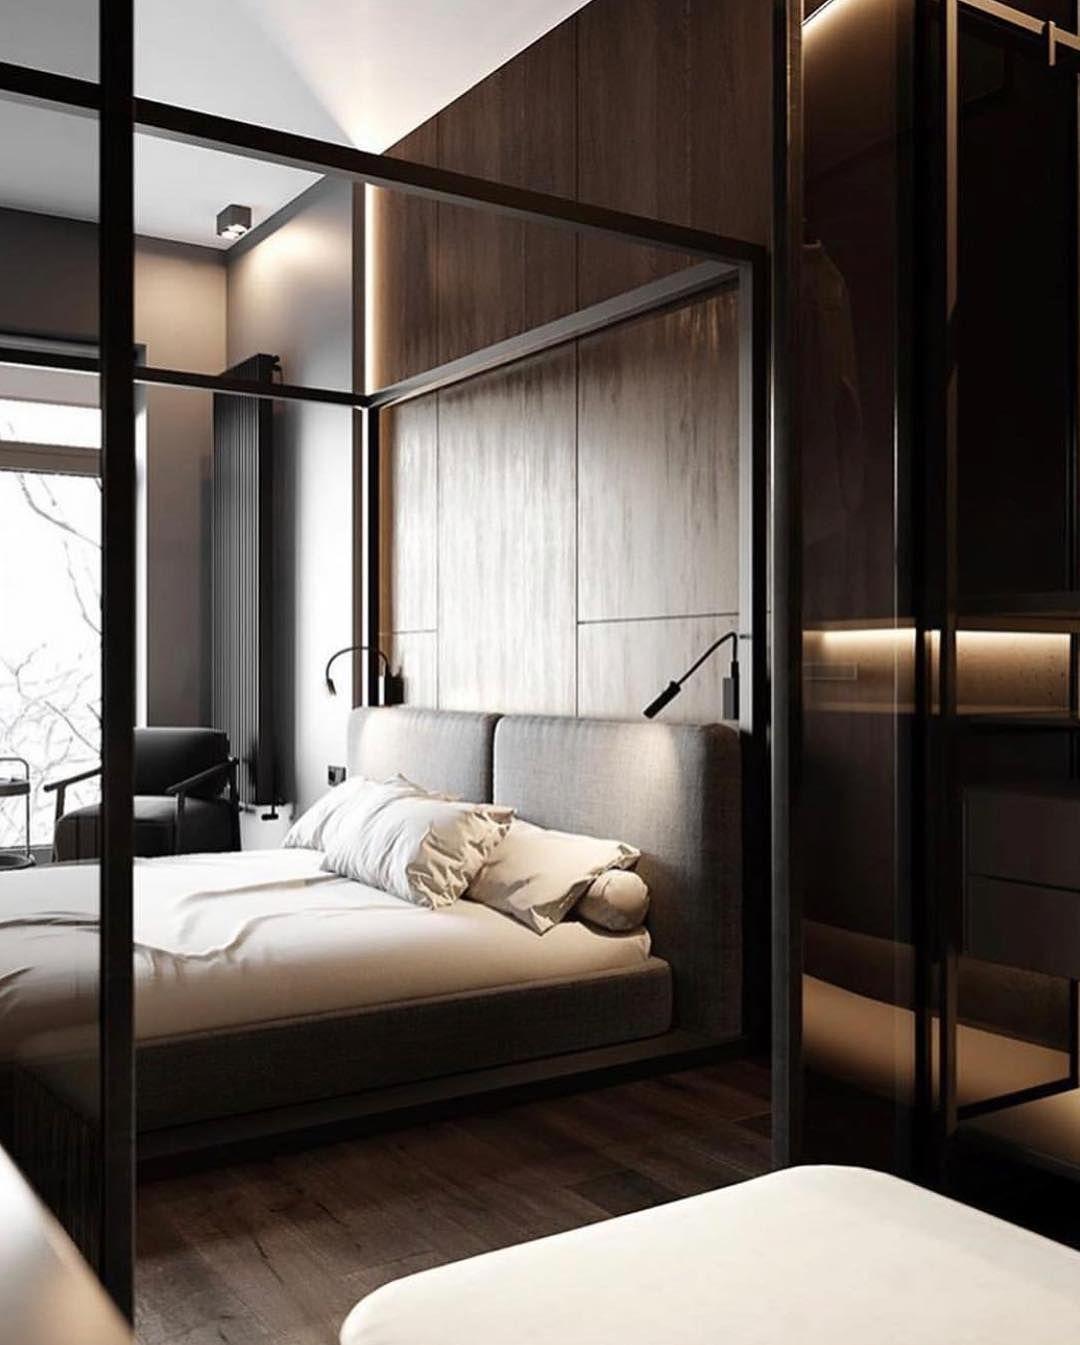 Home Decor In 2019 Interior Design School Interior Design